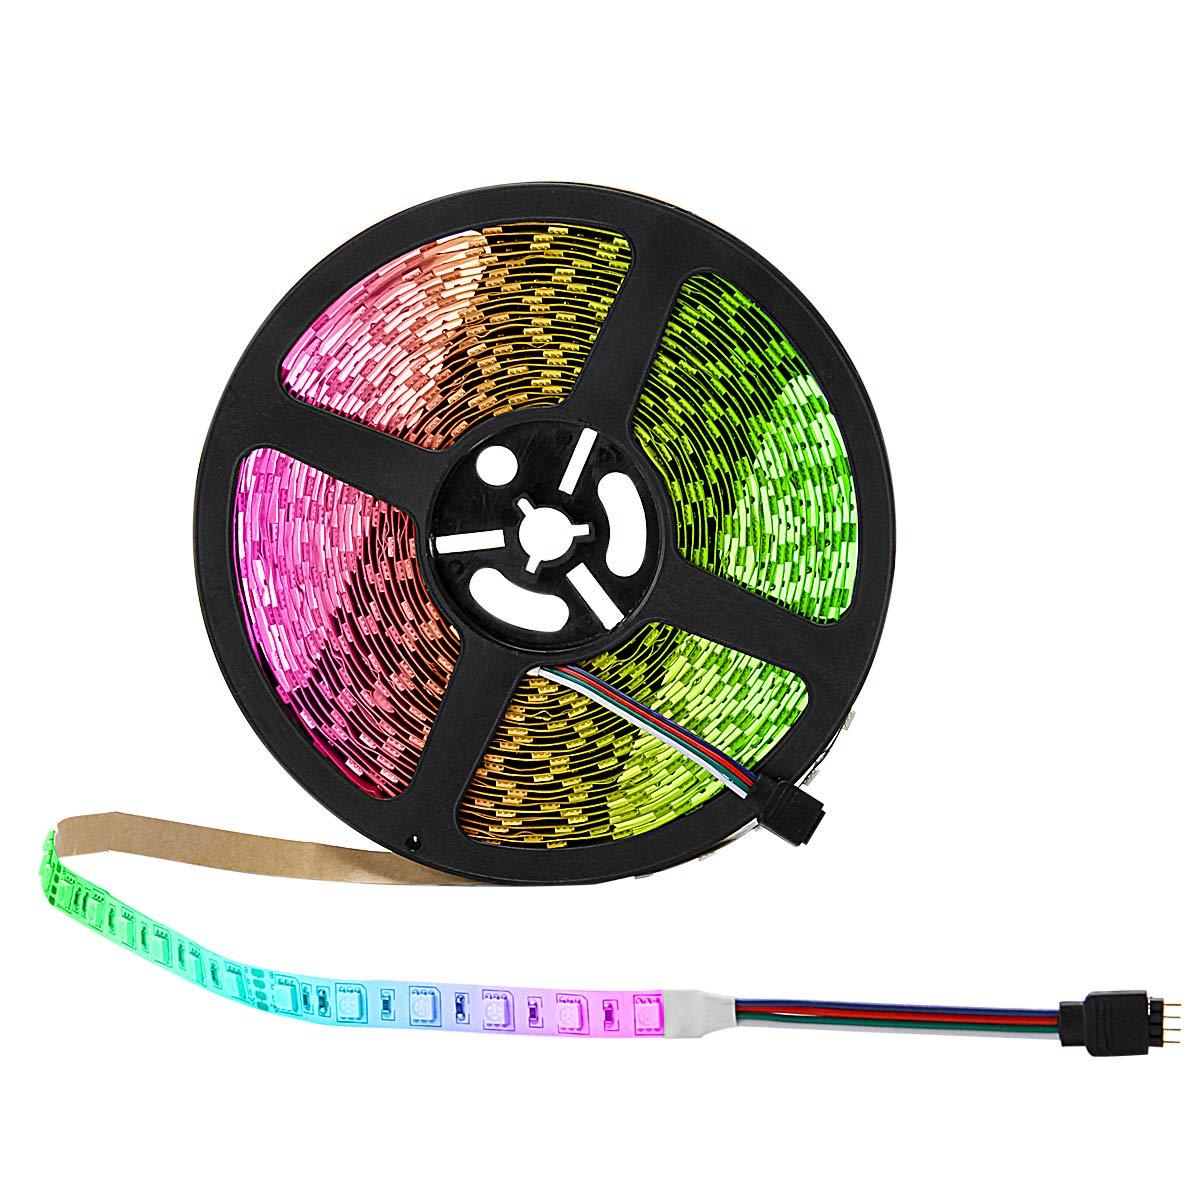 BINZET LED Strip Light - 32.8ft 5050 RGB 300LEDs 24V Color Changing Flexible Self-Adhesive Light Strip